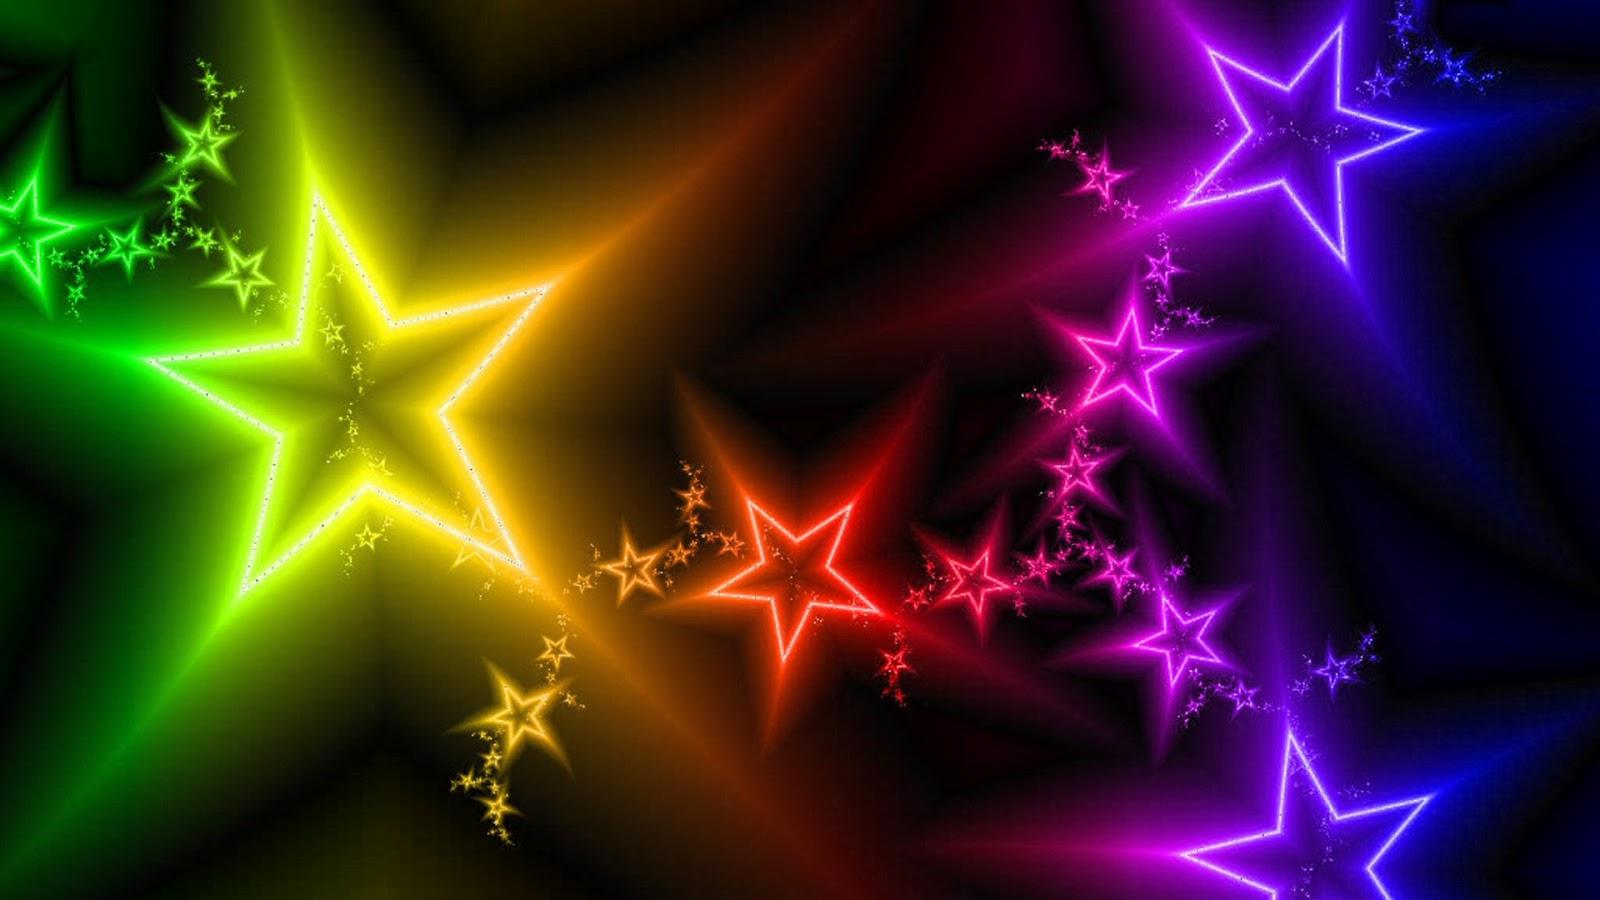 animated stars wallpaper animated stars wallpaper animated stars 1600x900